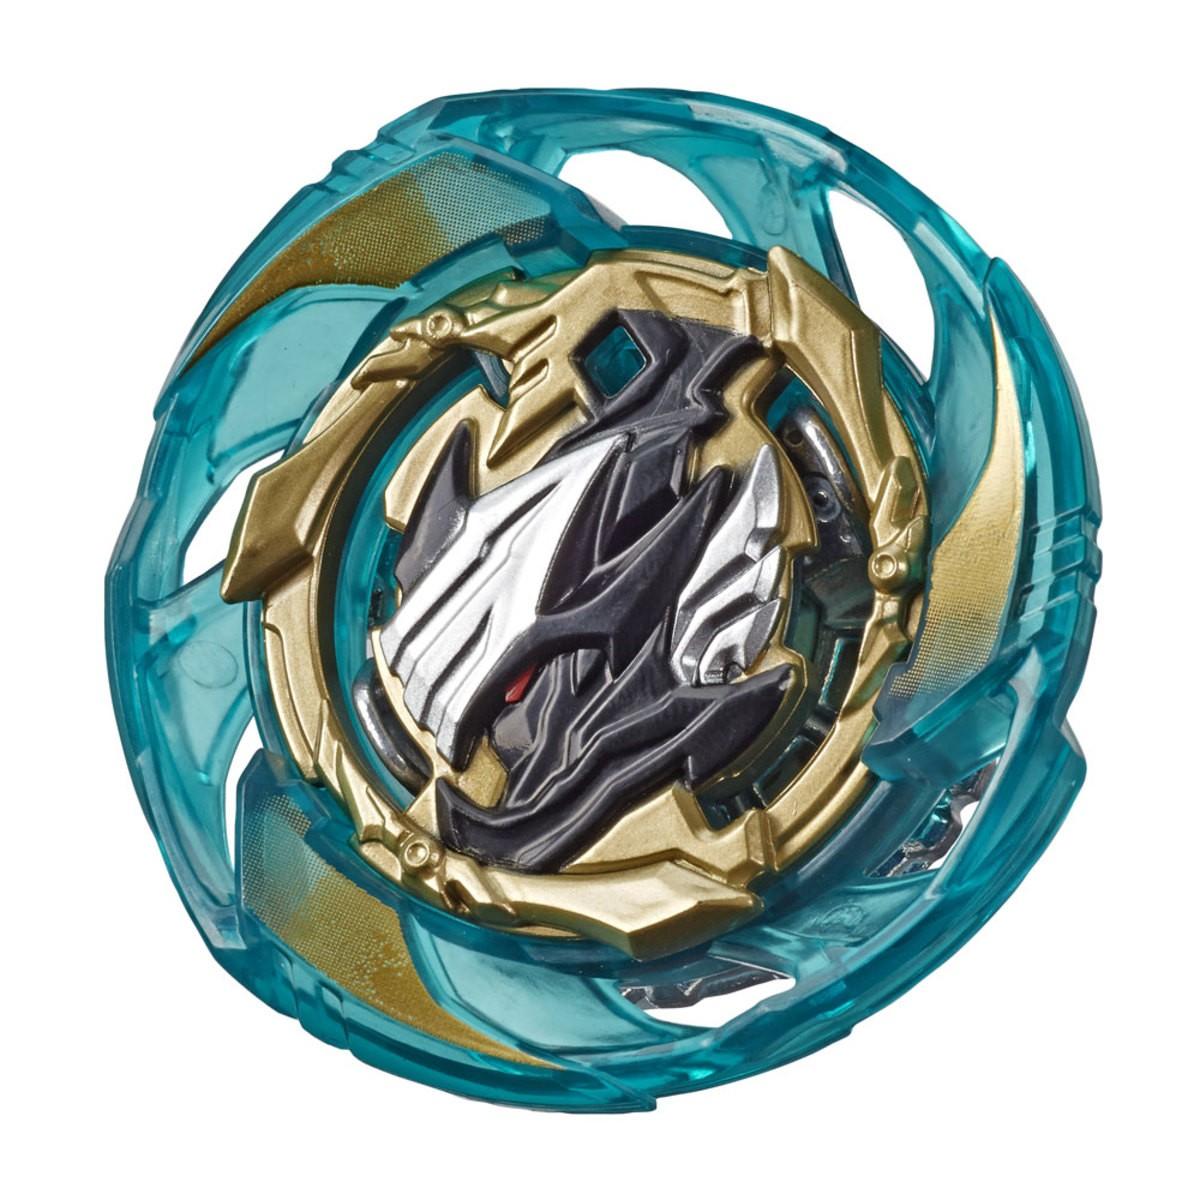 Beyblade Burst Rise - Hyper Sphere - Air Knight K5 - Hasbro